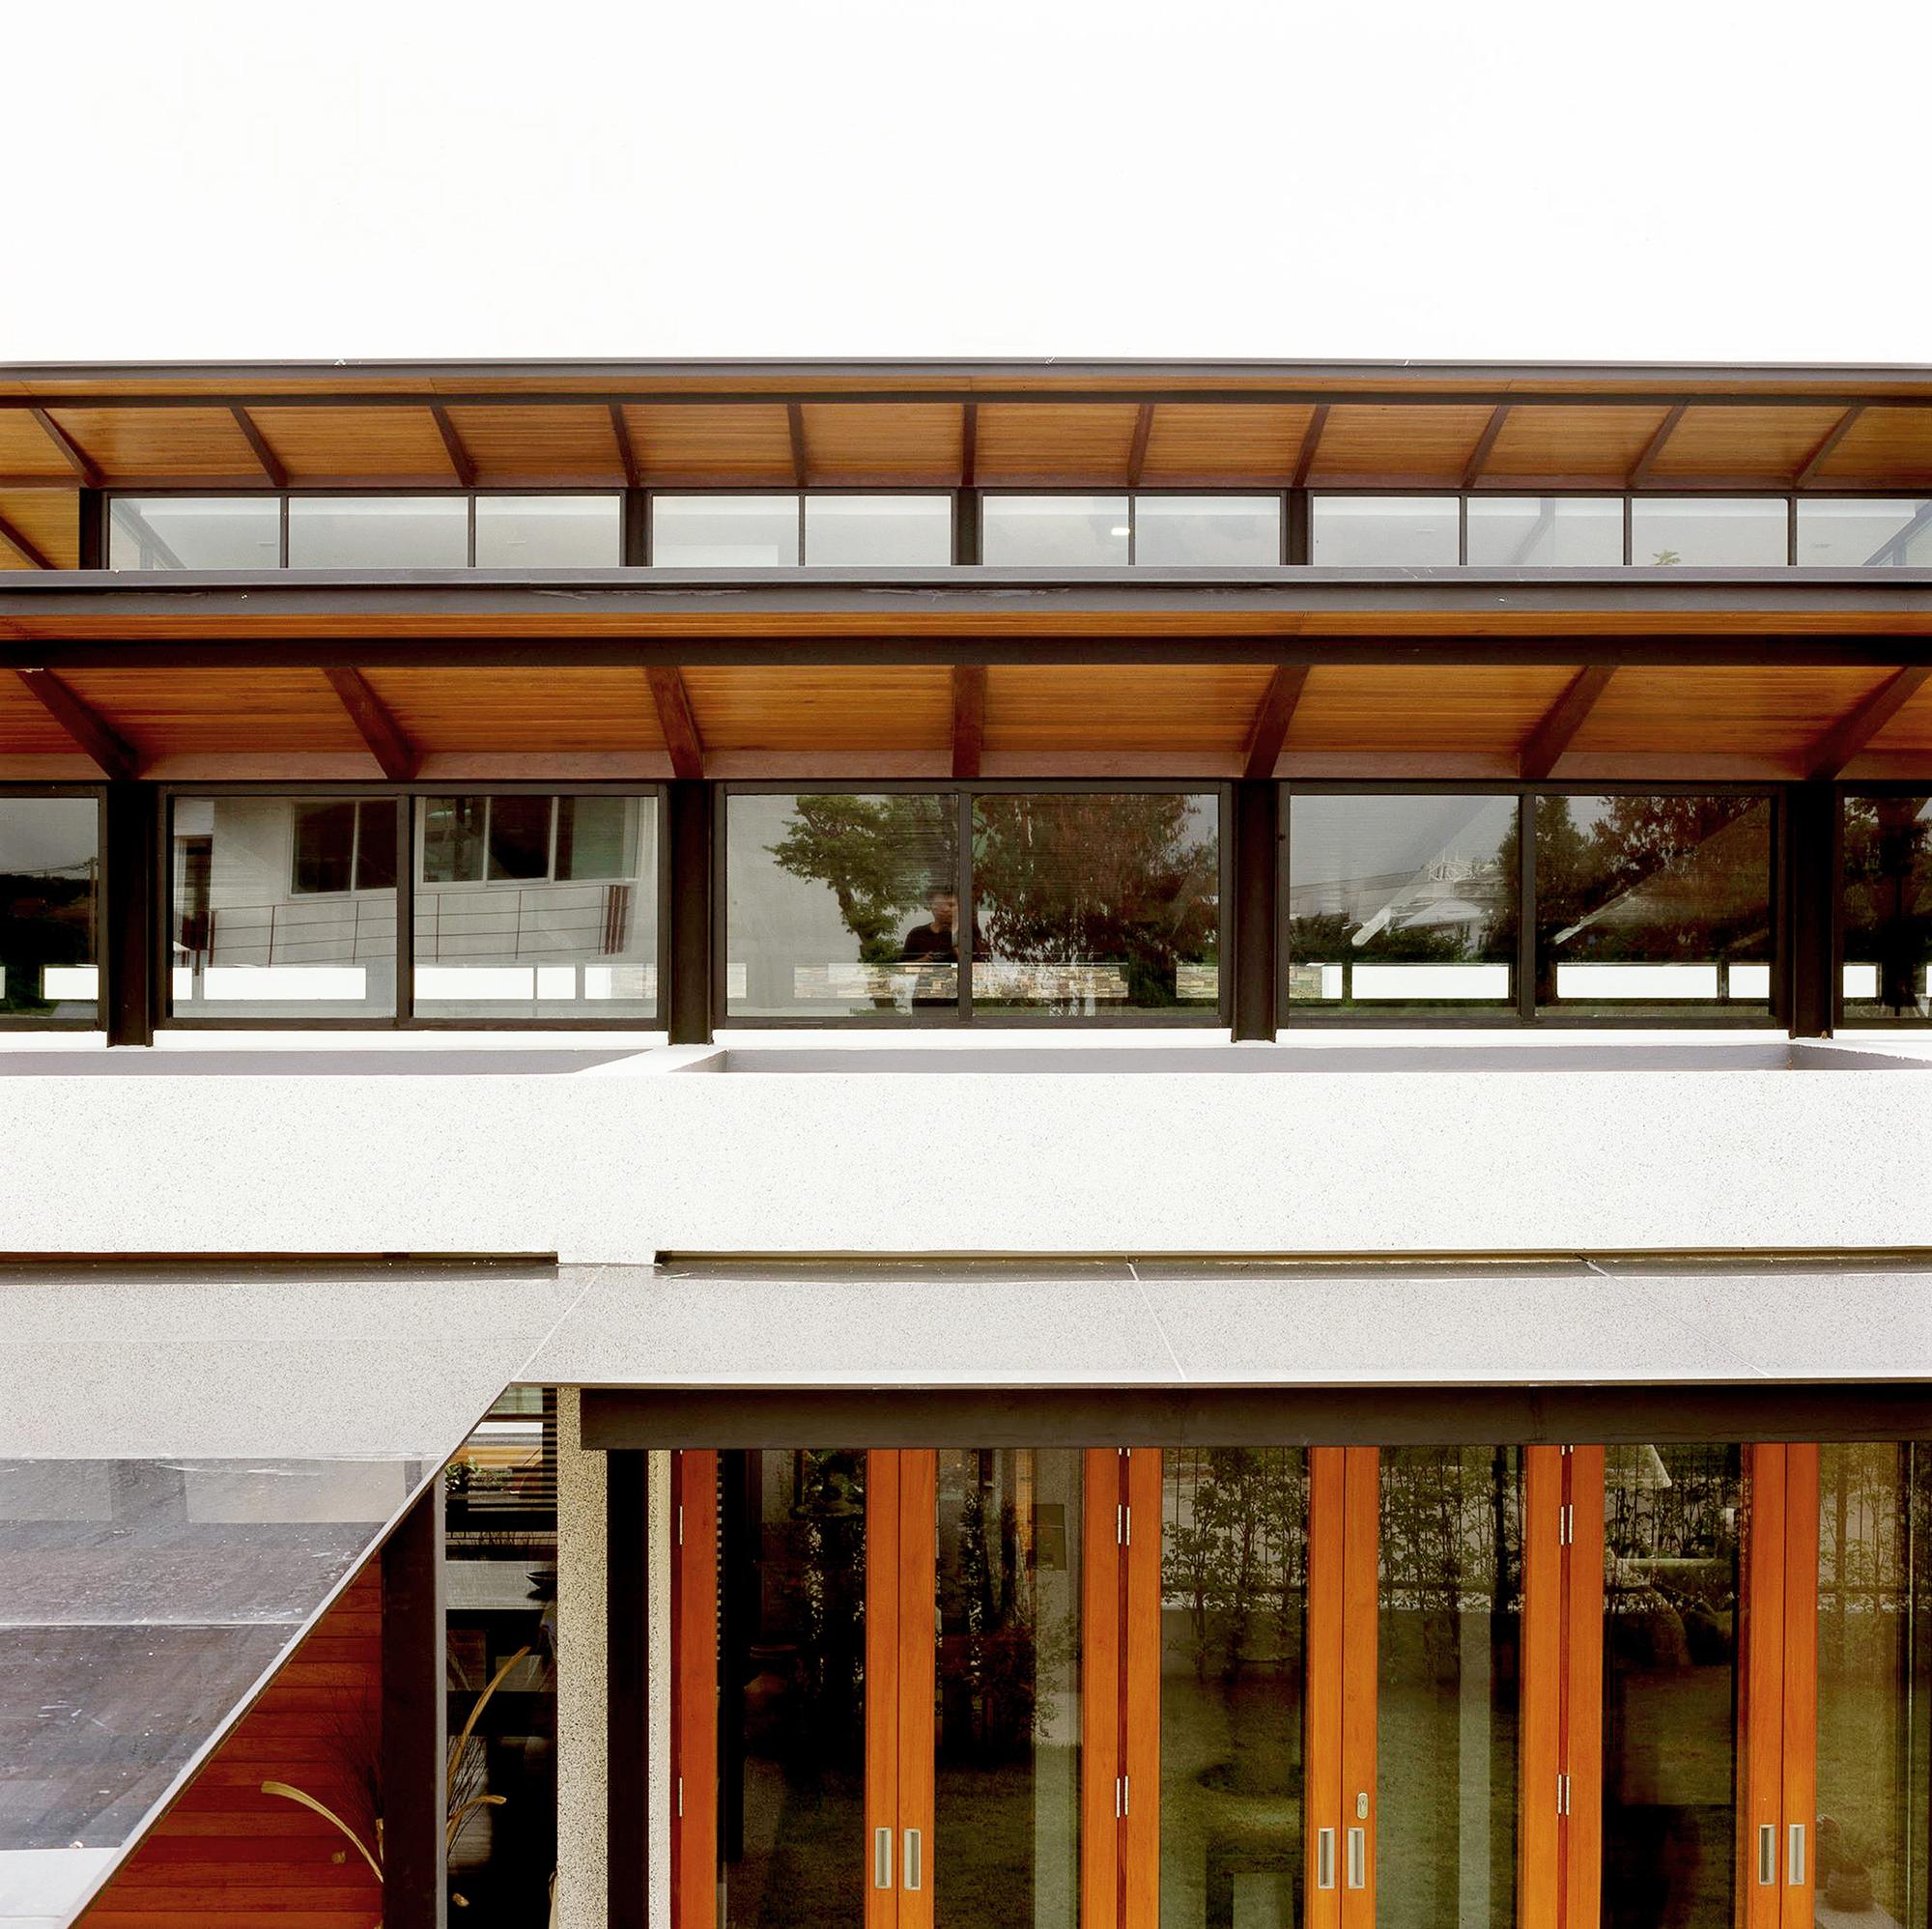 Bridge House By Junsekino Architect And Design: Gallery Of Nature House / Junsekino Architect And Design